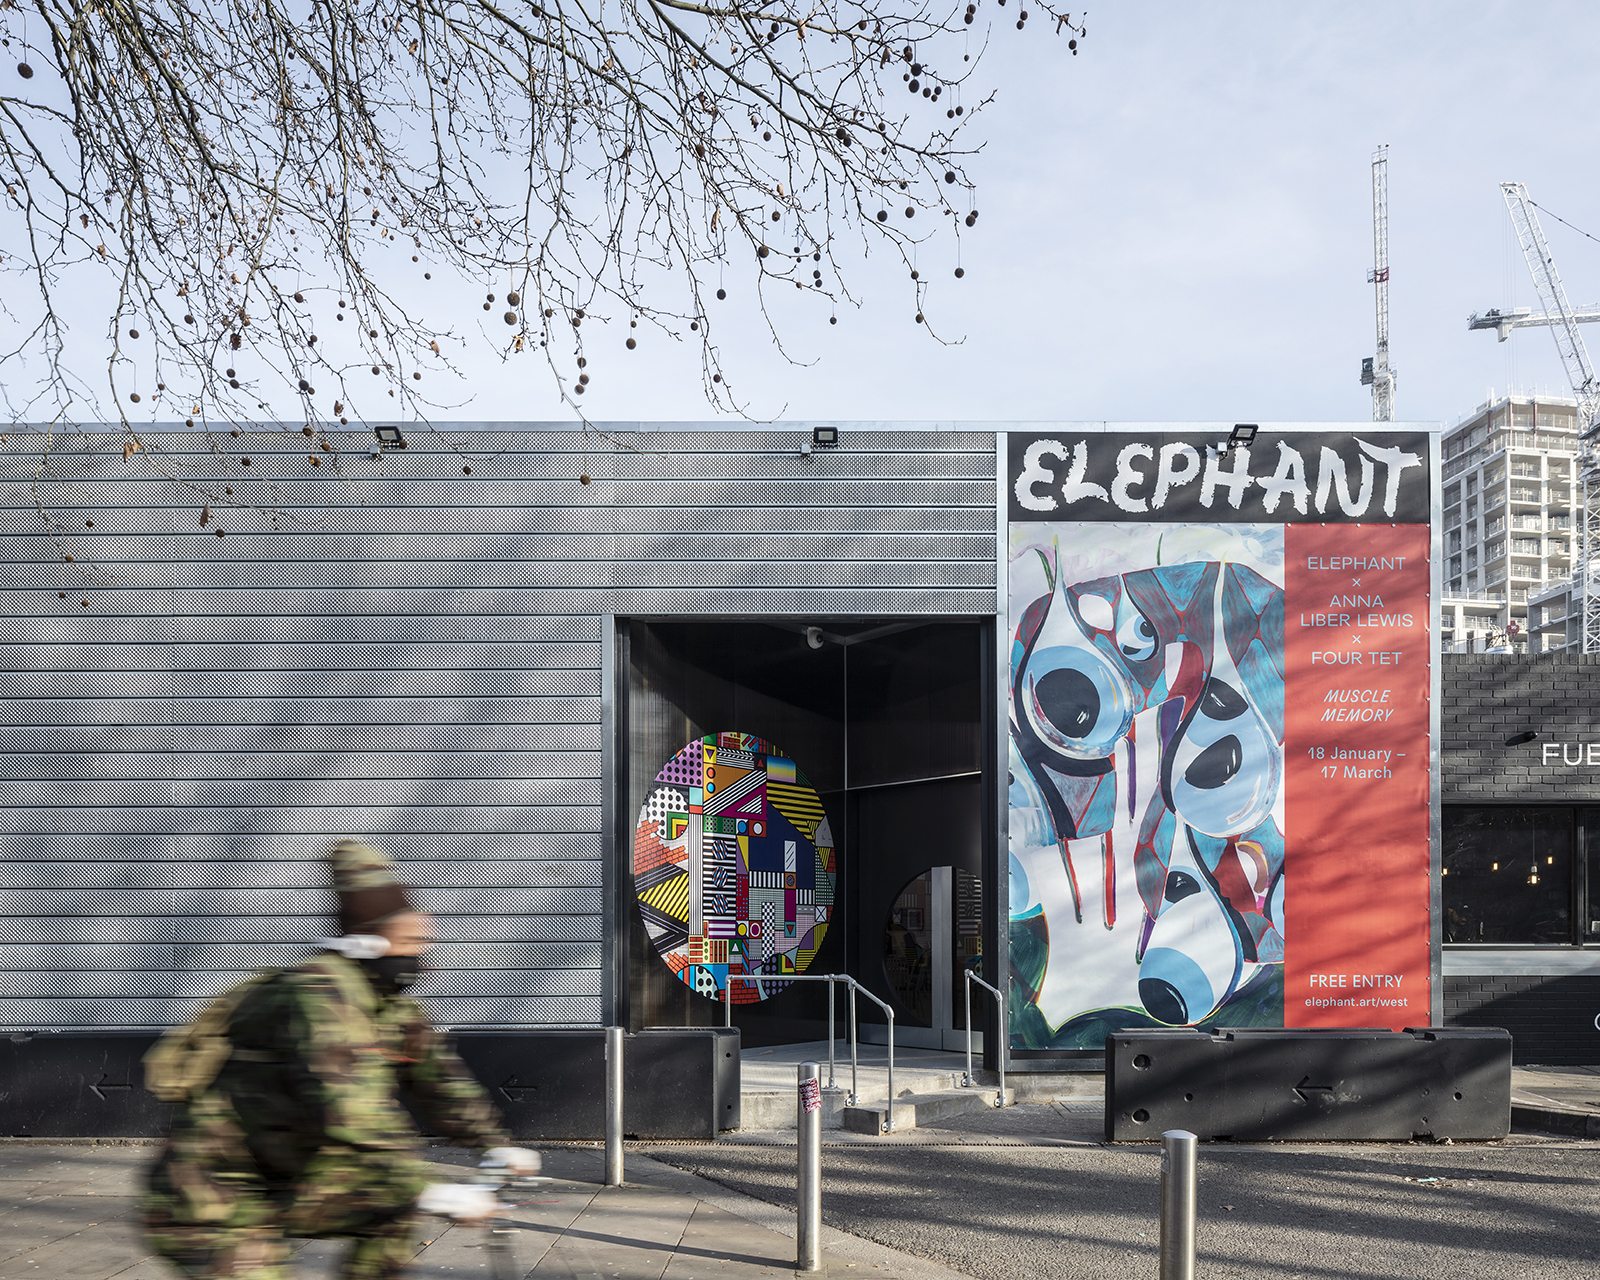 374_elephant_jd.jpg